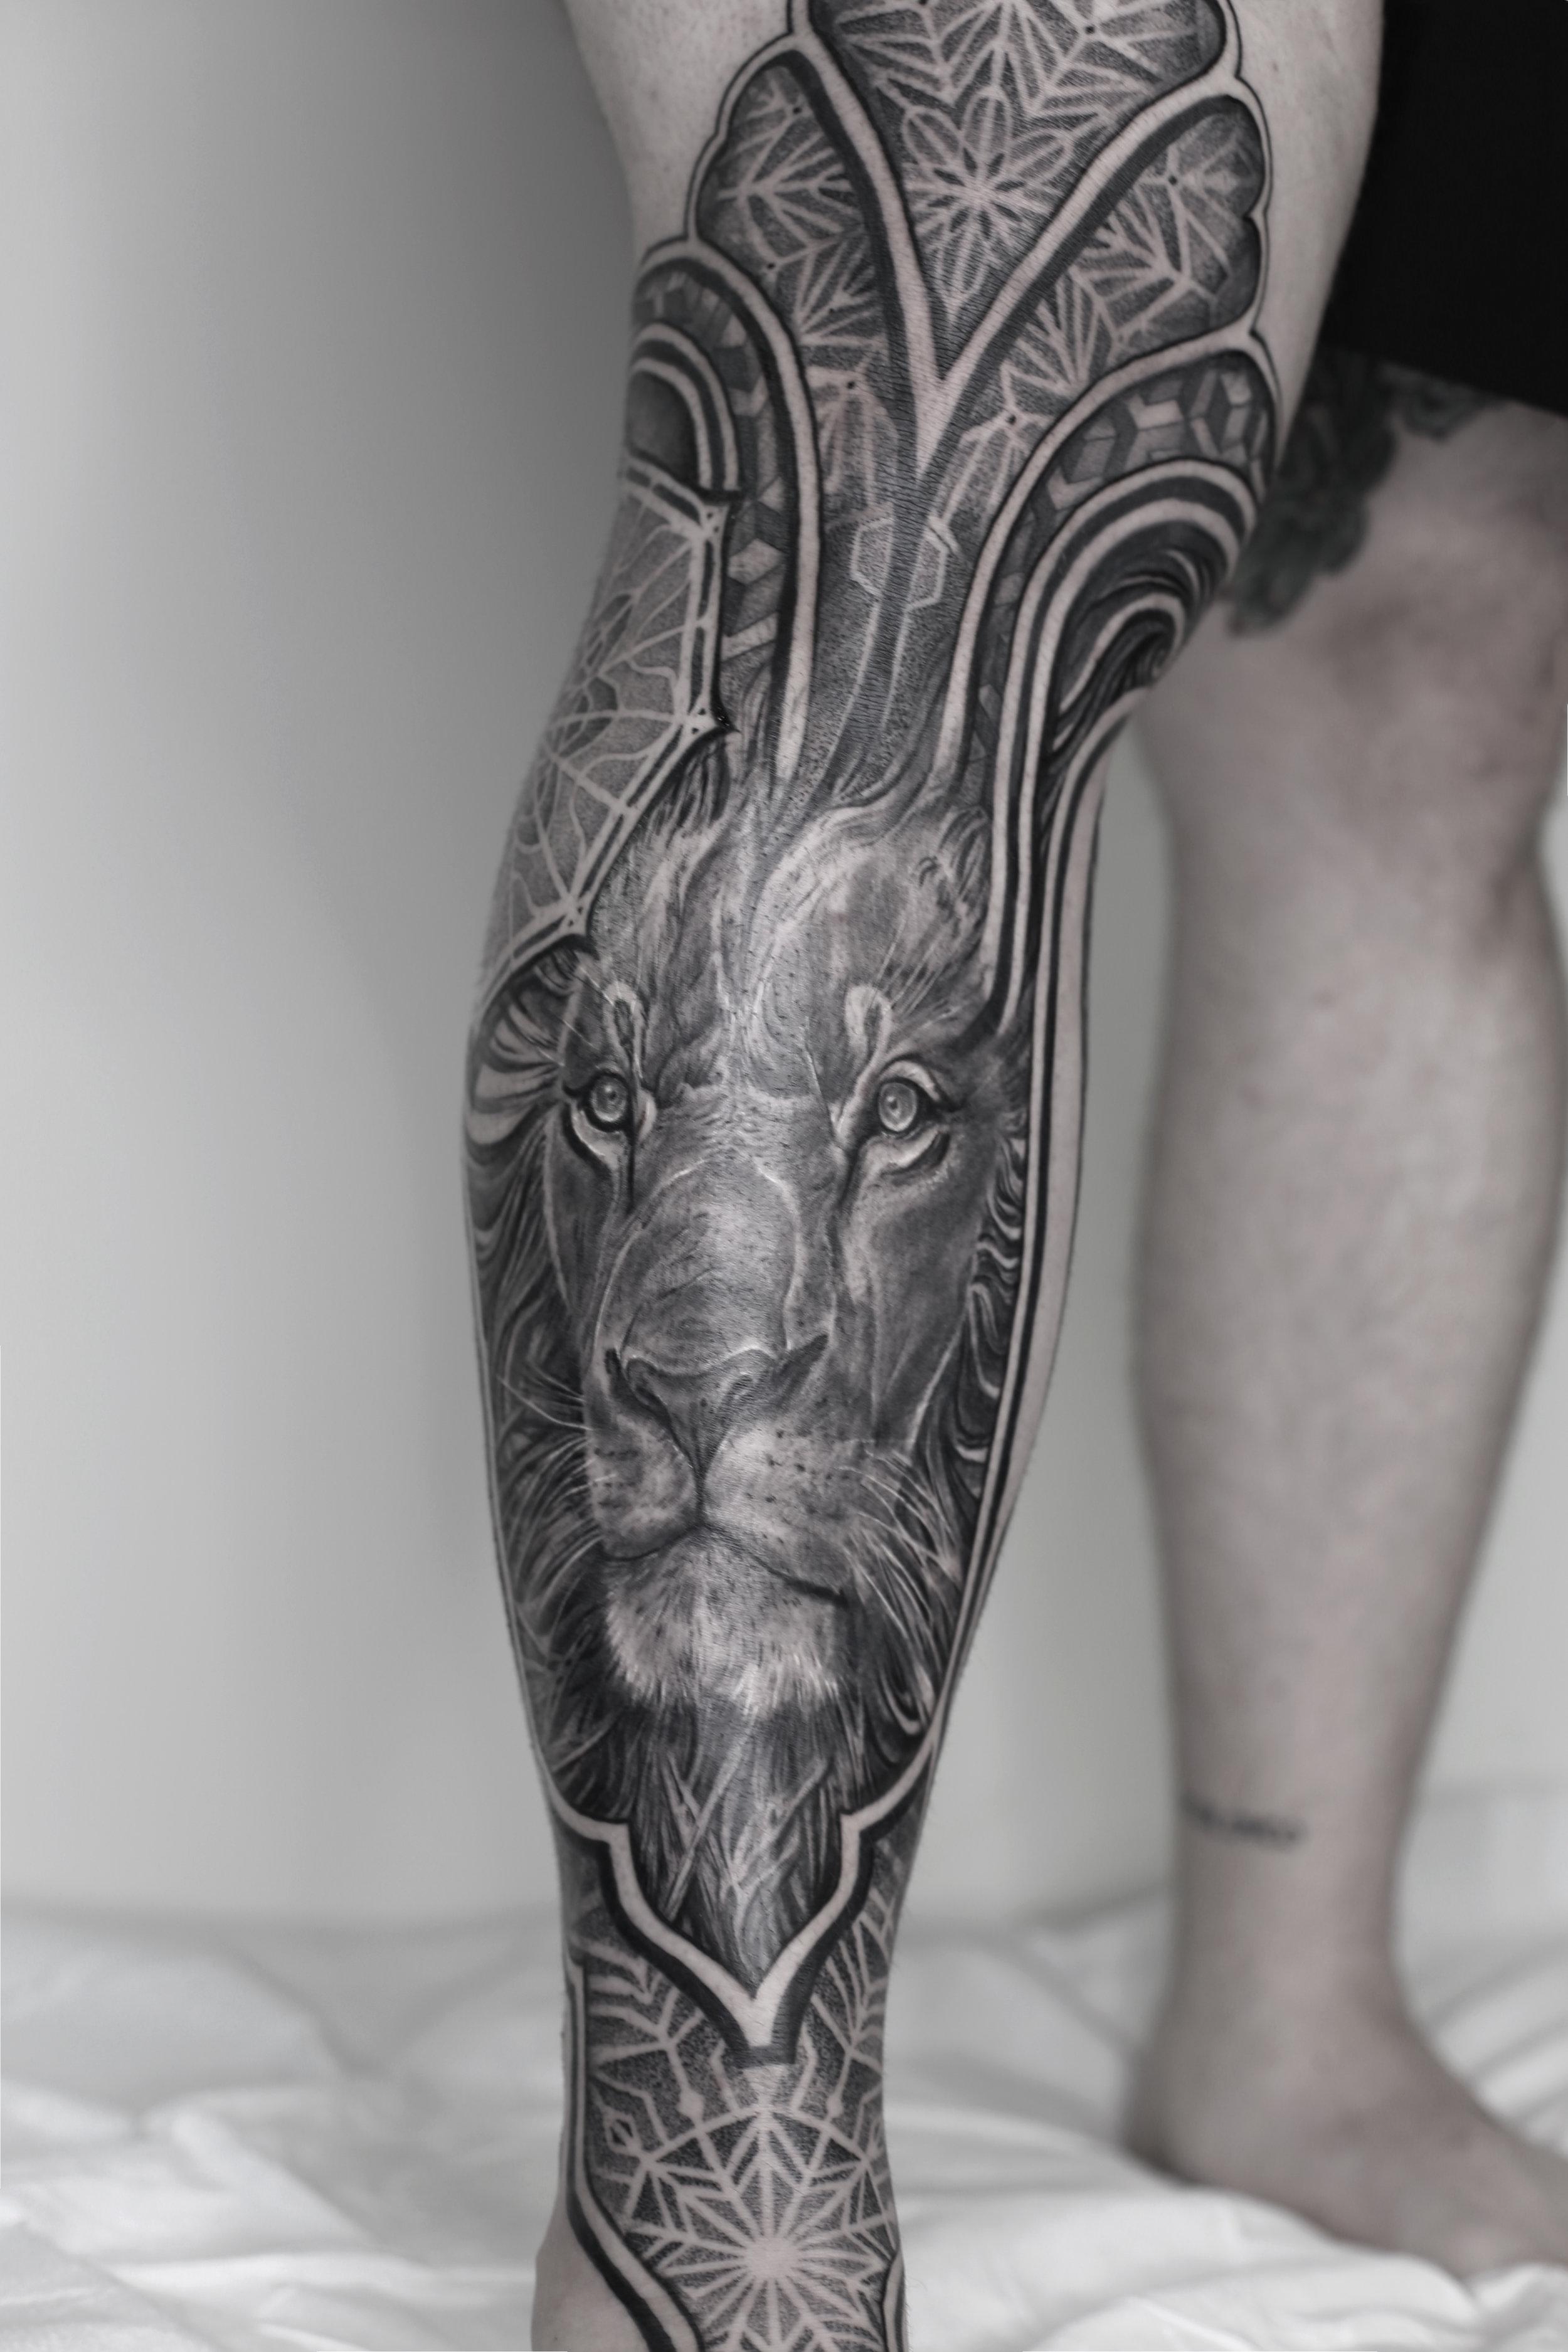 lion ejay tattoo singleton tattoo trinity groves leg sleeve .jpg